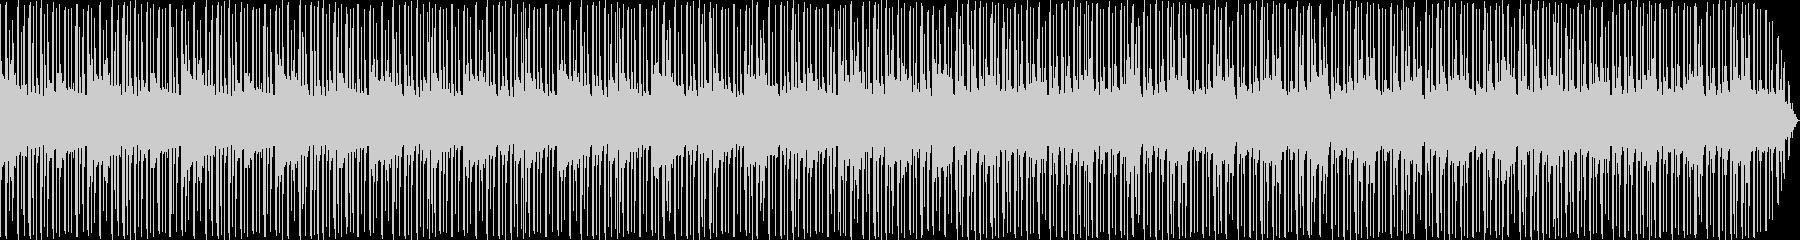 Jazz/NeoSoul系の生楽器BGMの未再生の波形